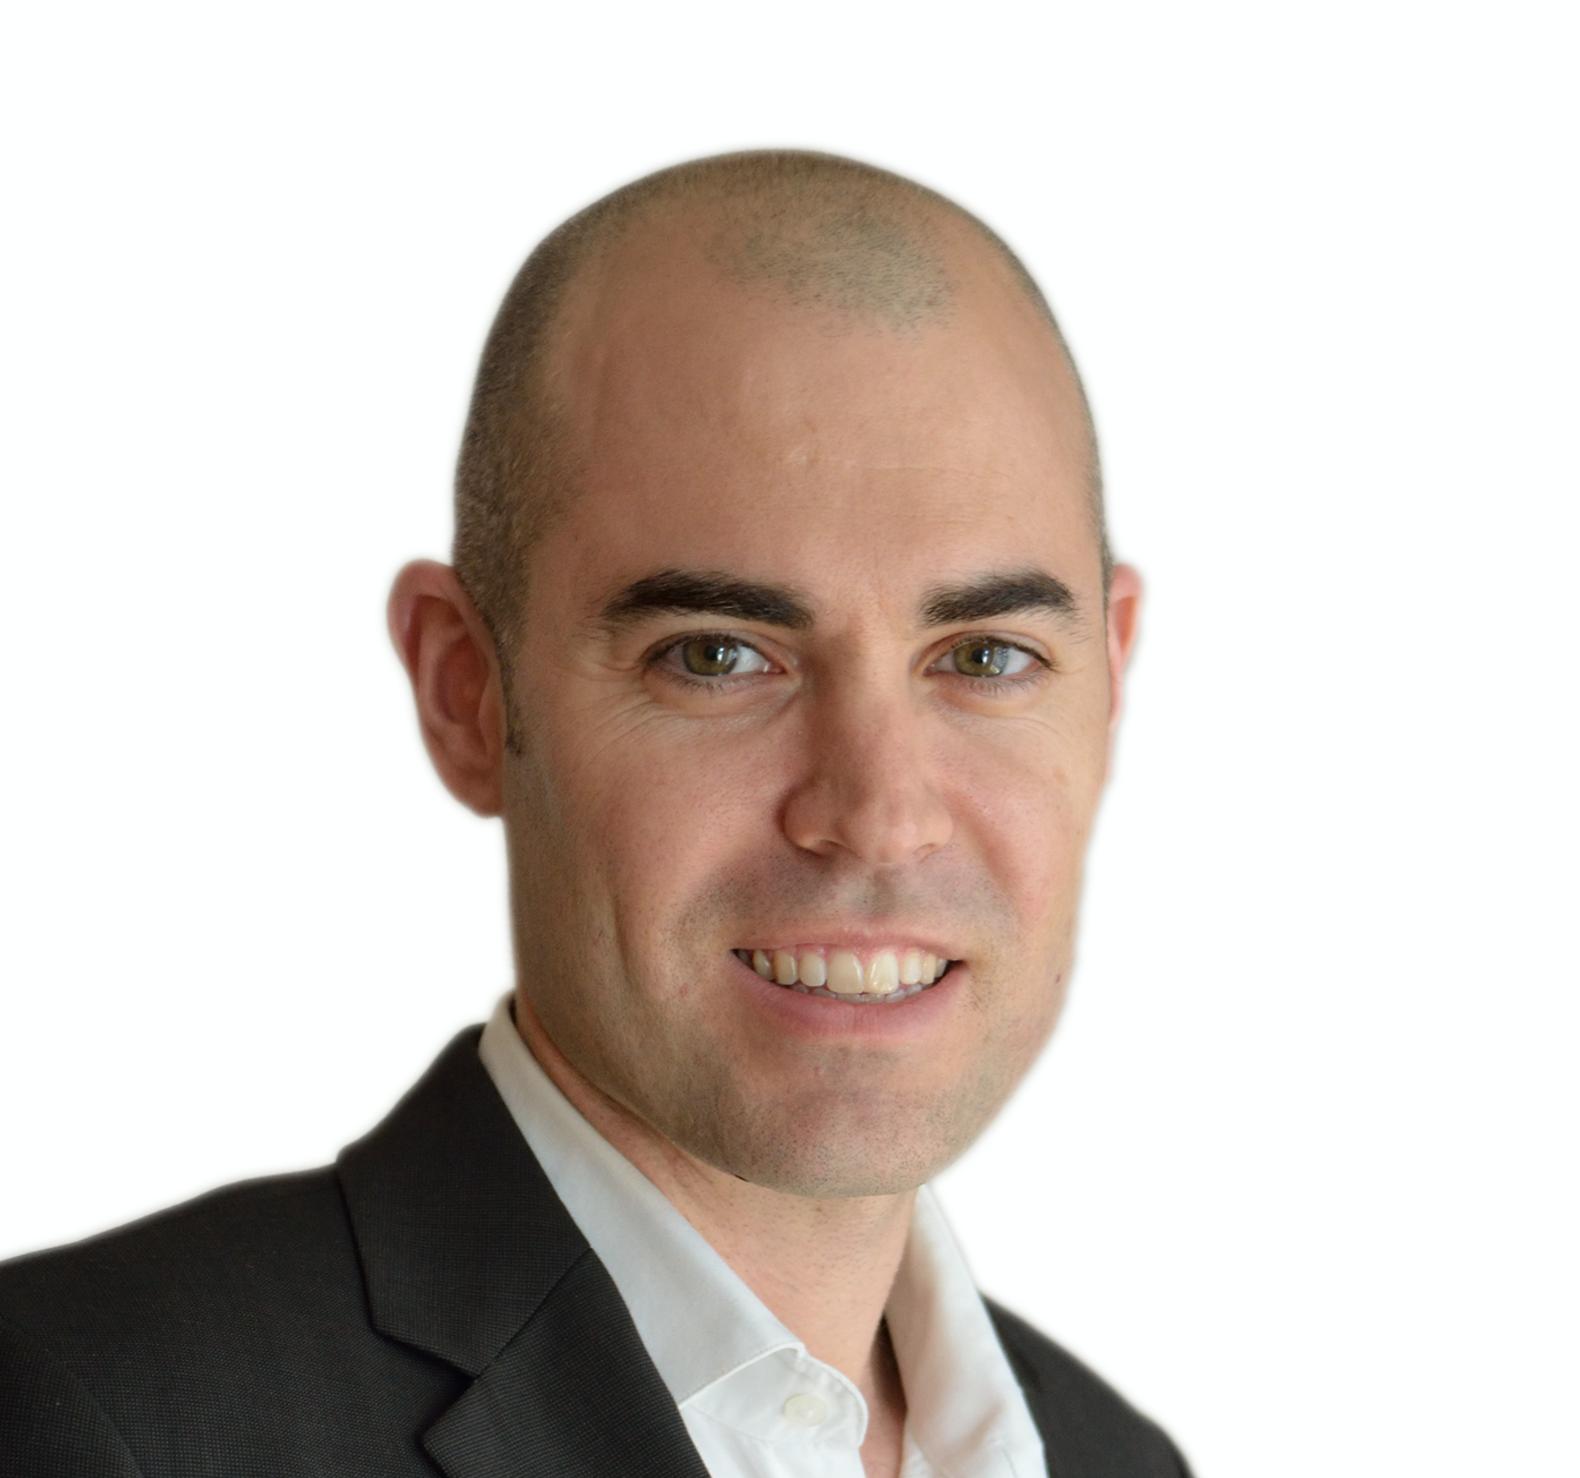 "<a href=""https://www.linkedin.com/in/ernestlara ""target=""_blank"">Ernest Lara →</a><strong></strong><strong>Executive Director   Richi Entrepreneurs</strong>"